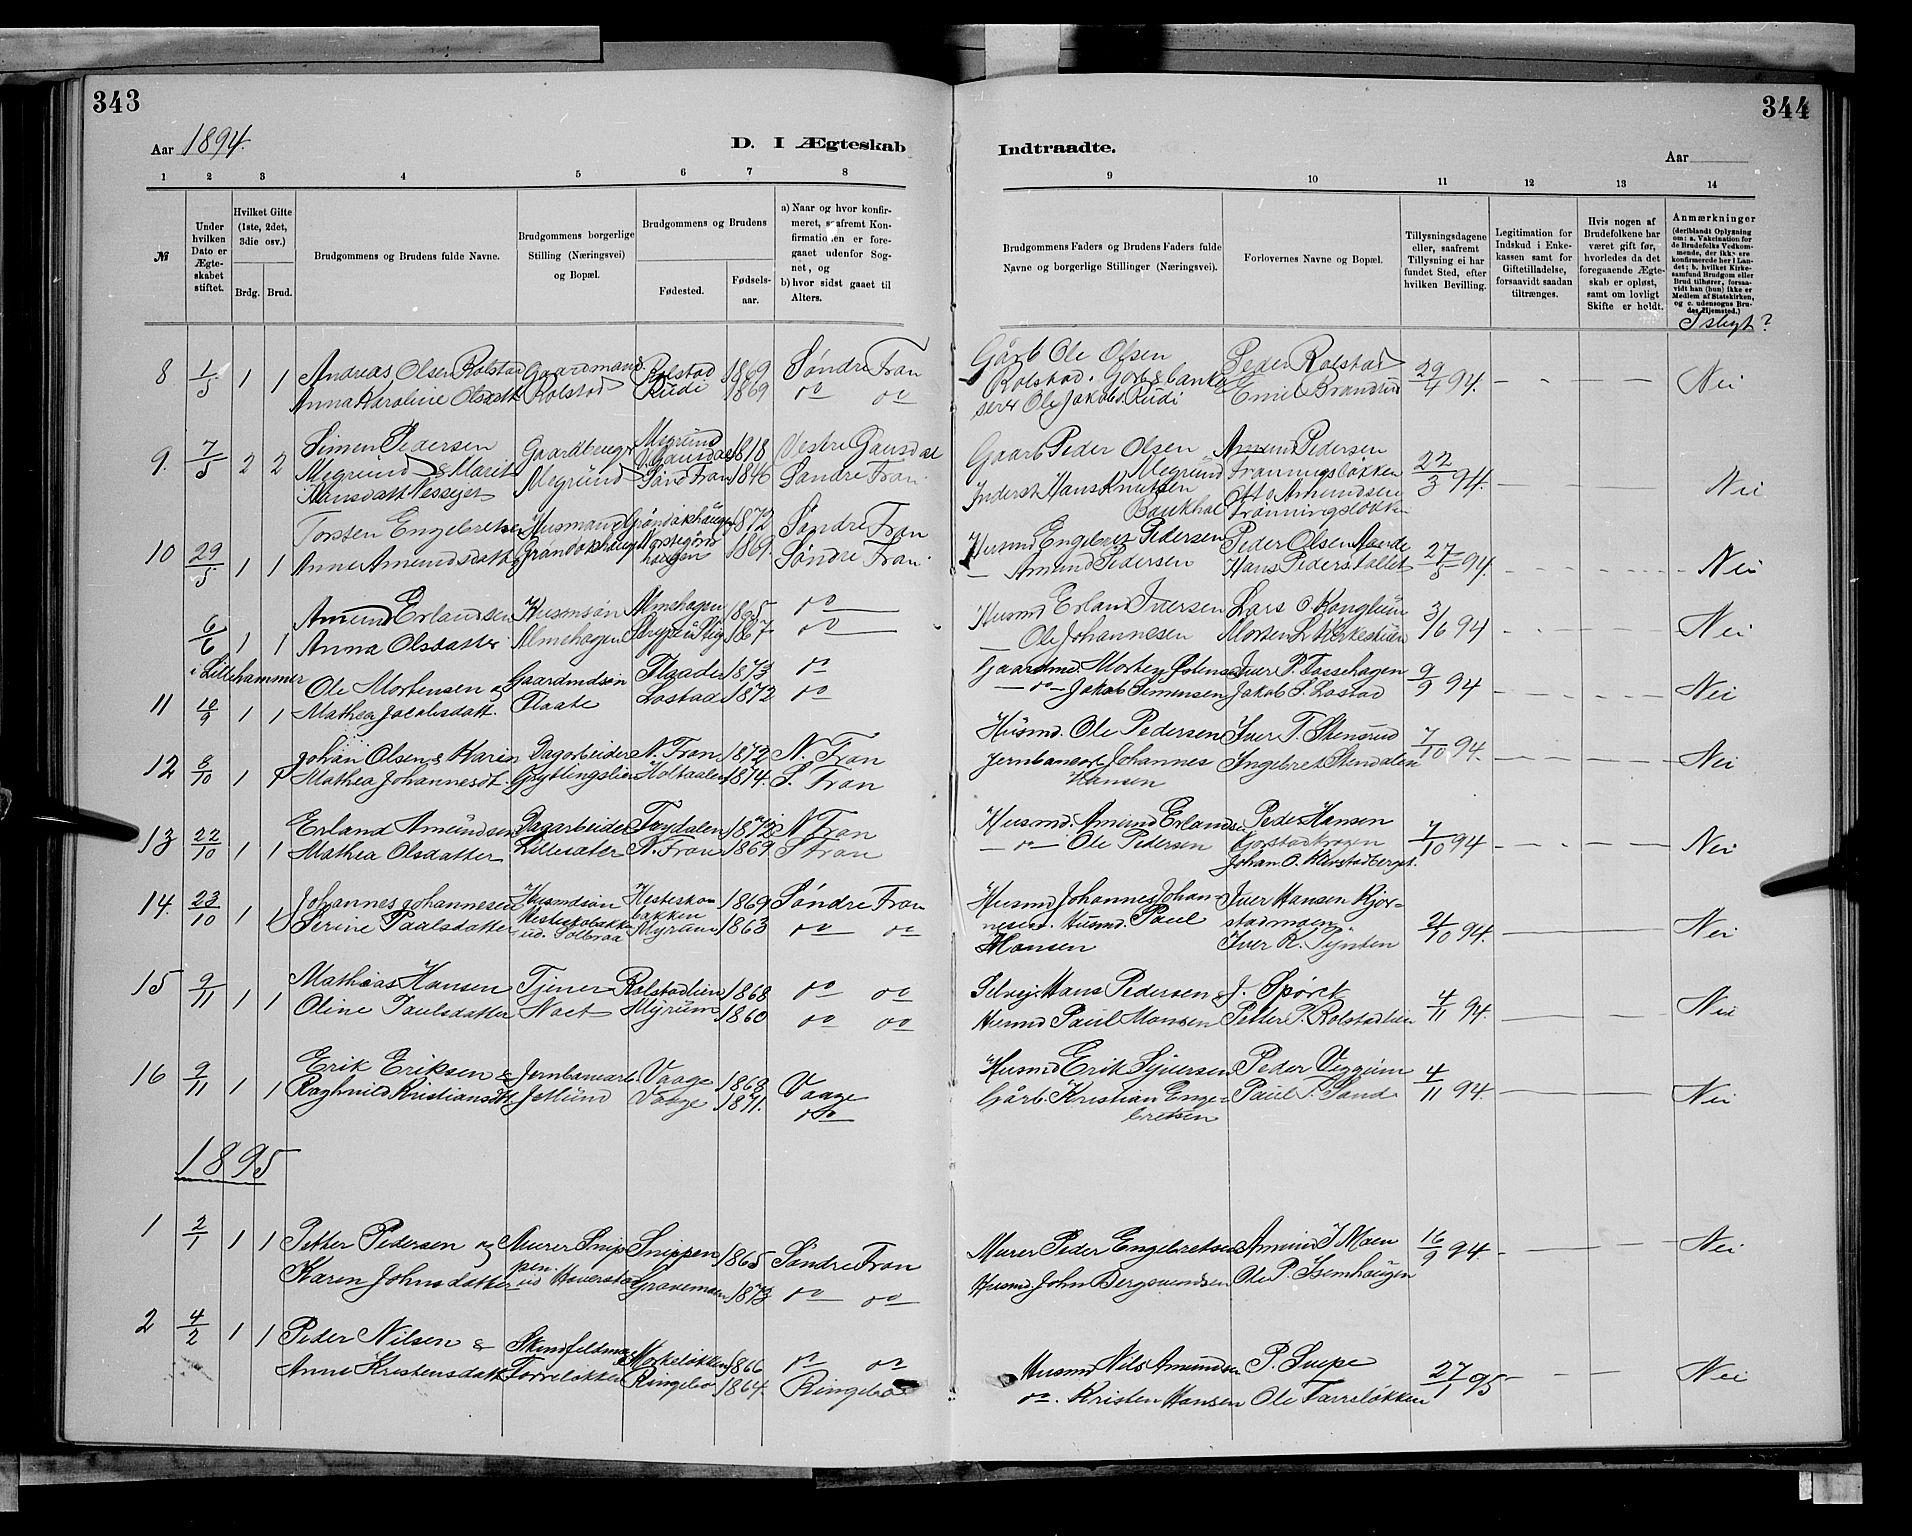 SAH, Sør-Fron prestekontor, H/Ha/Hab/L0003: Klokkerbok nr. 3, 1884-1896, s. 343-344